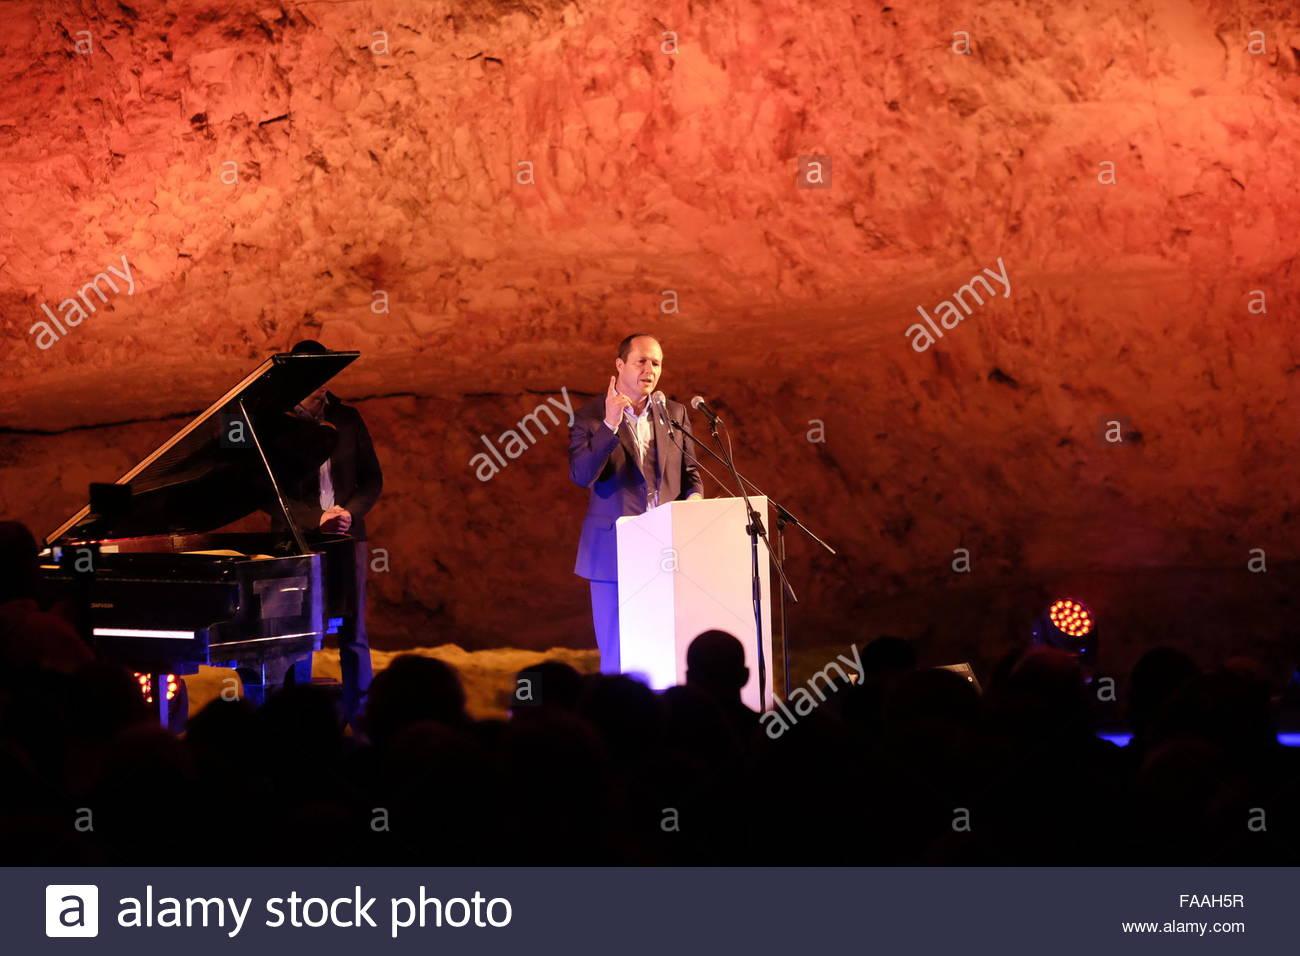 Nir Barkat mayor of Jerusalem addressing to the audience before a musical performance  inside Zedekiah's Cave - Stock Image